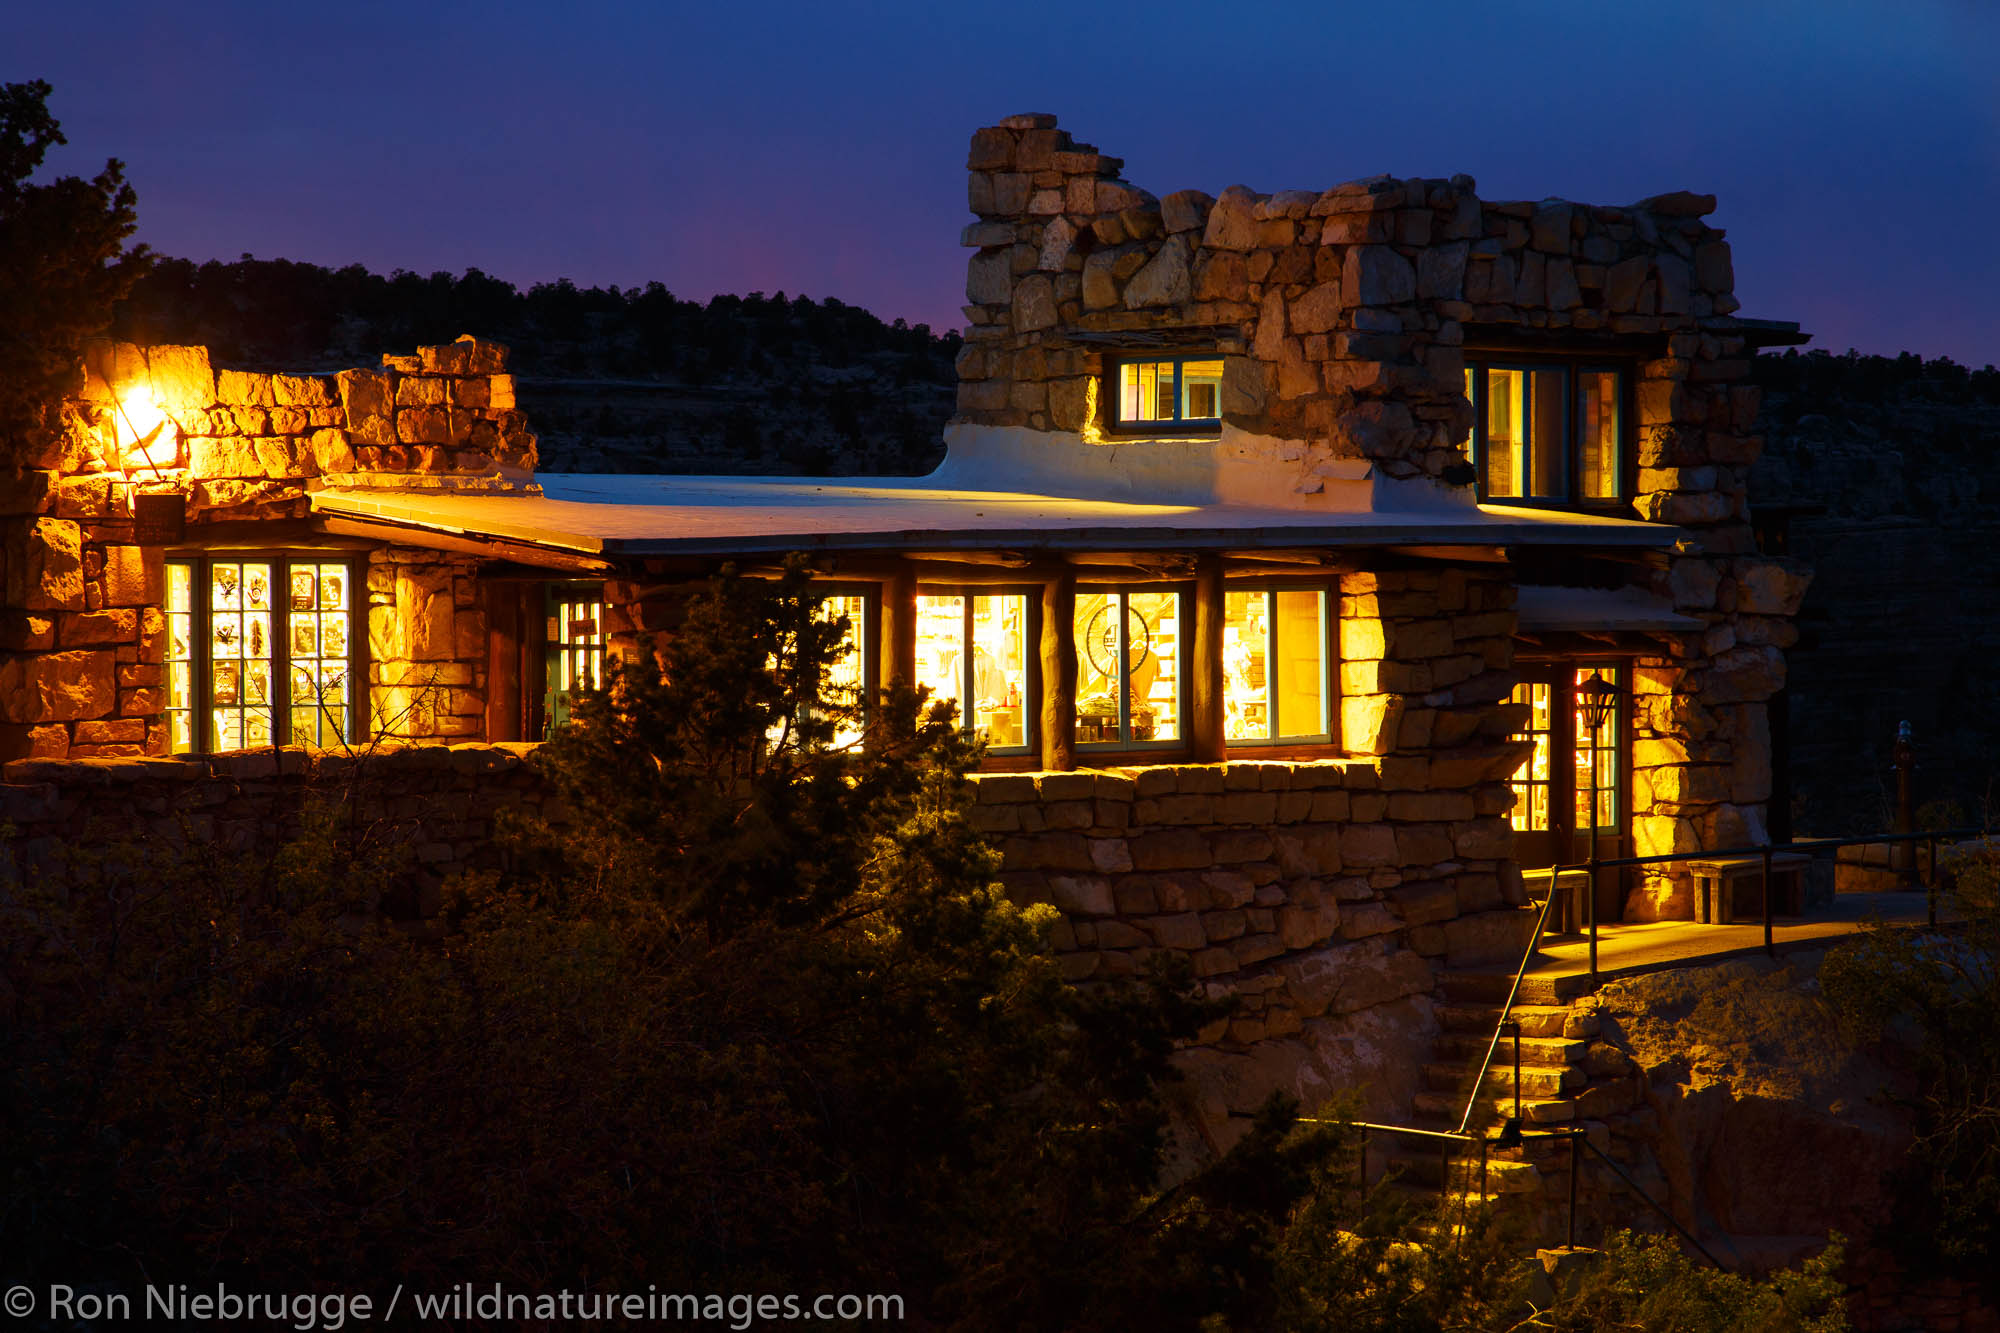 Lookout Studio Gift Store, South Rim, Grand Canyon National Park, Arizona.